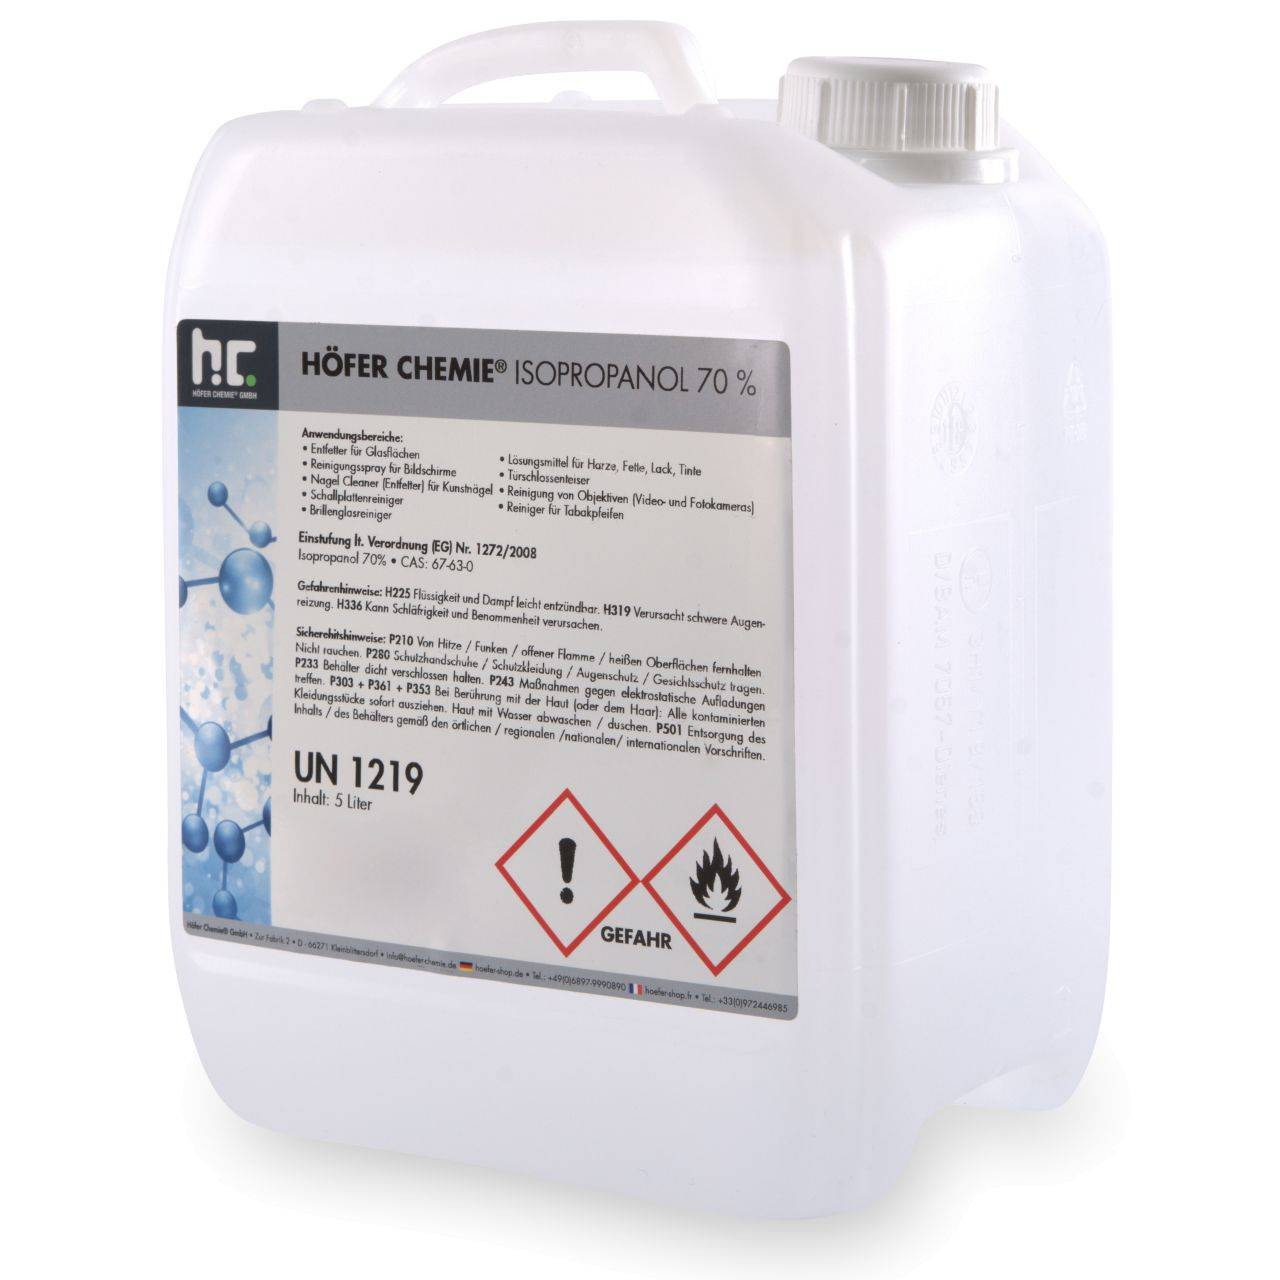 Höfer Chemie 10 l alcool isopropylique 70% (2 x 5 l)